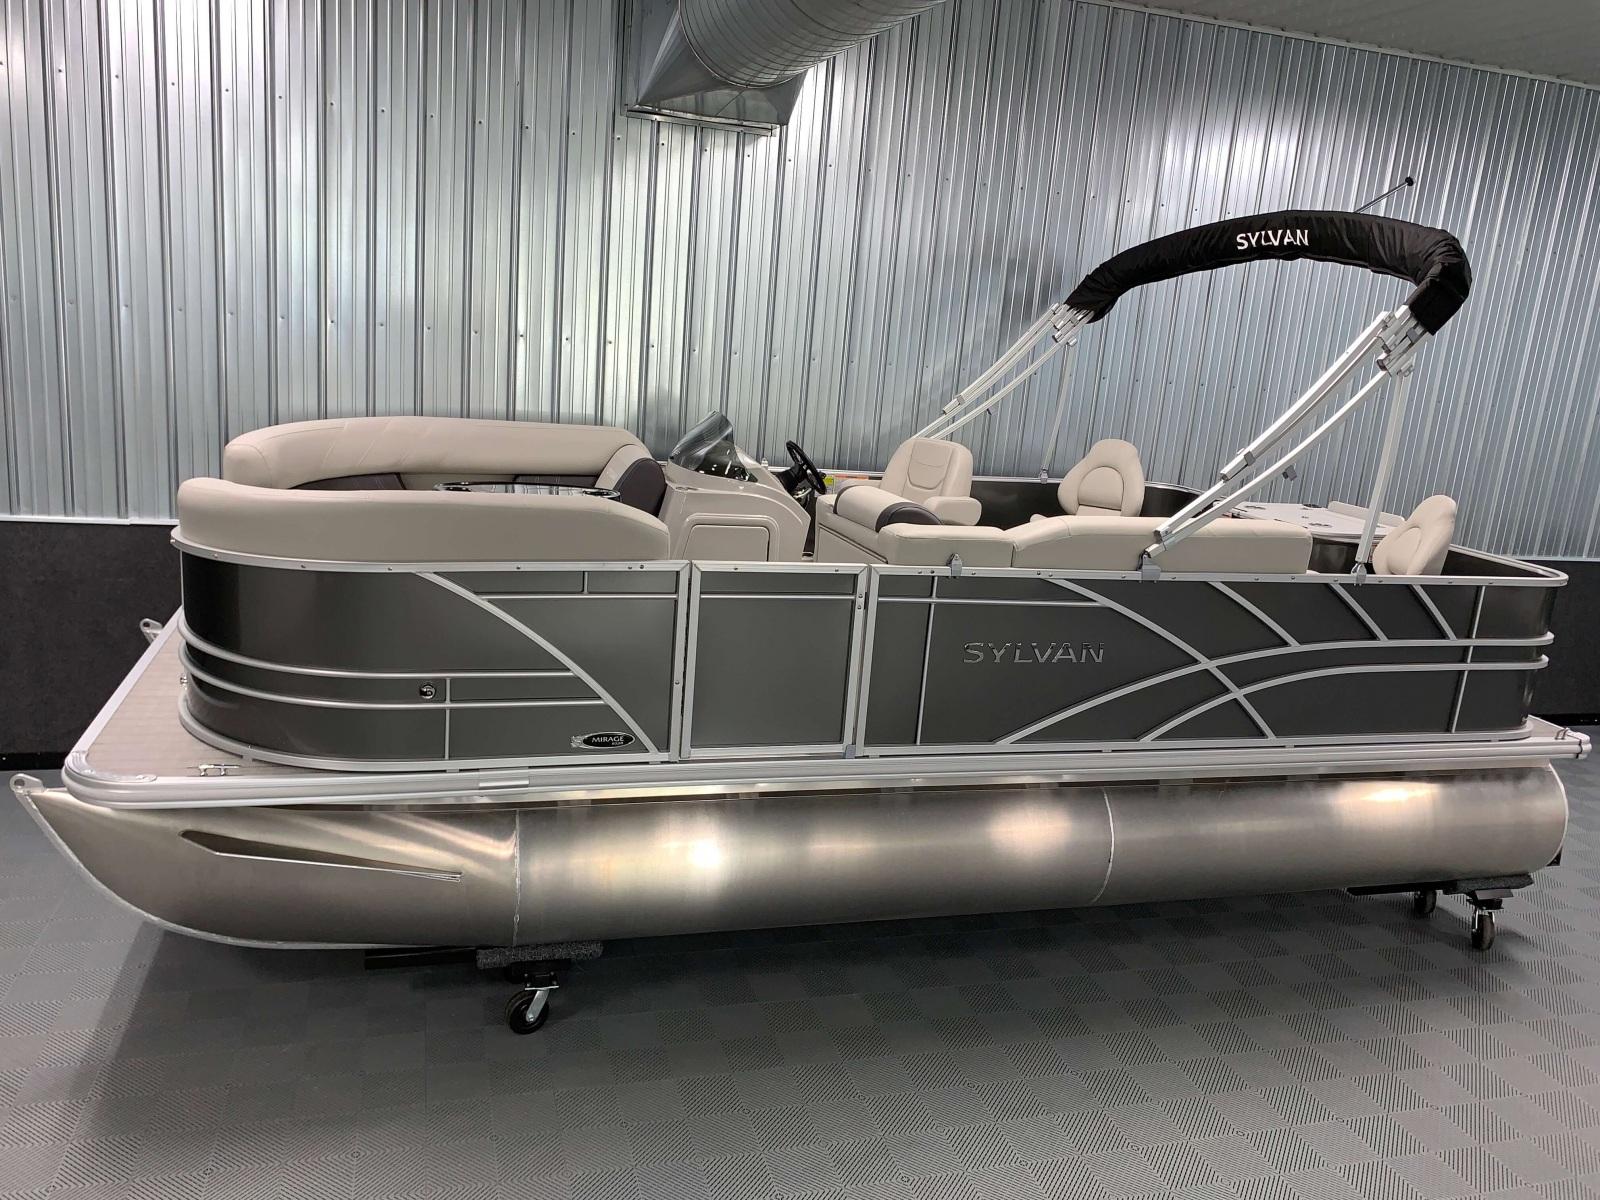 D-Rail Panel Design of a 2021 Sylvan Mirage 8520 Party Fish Pontoon Boat